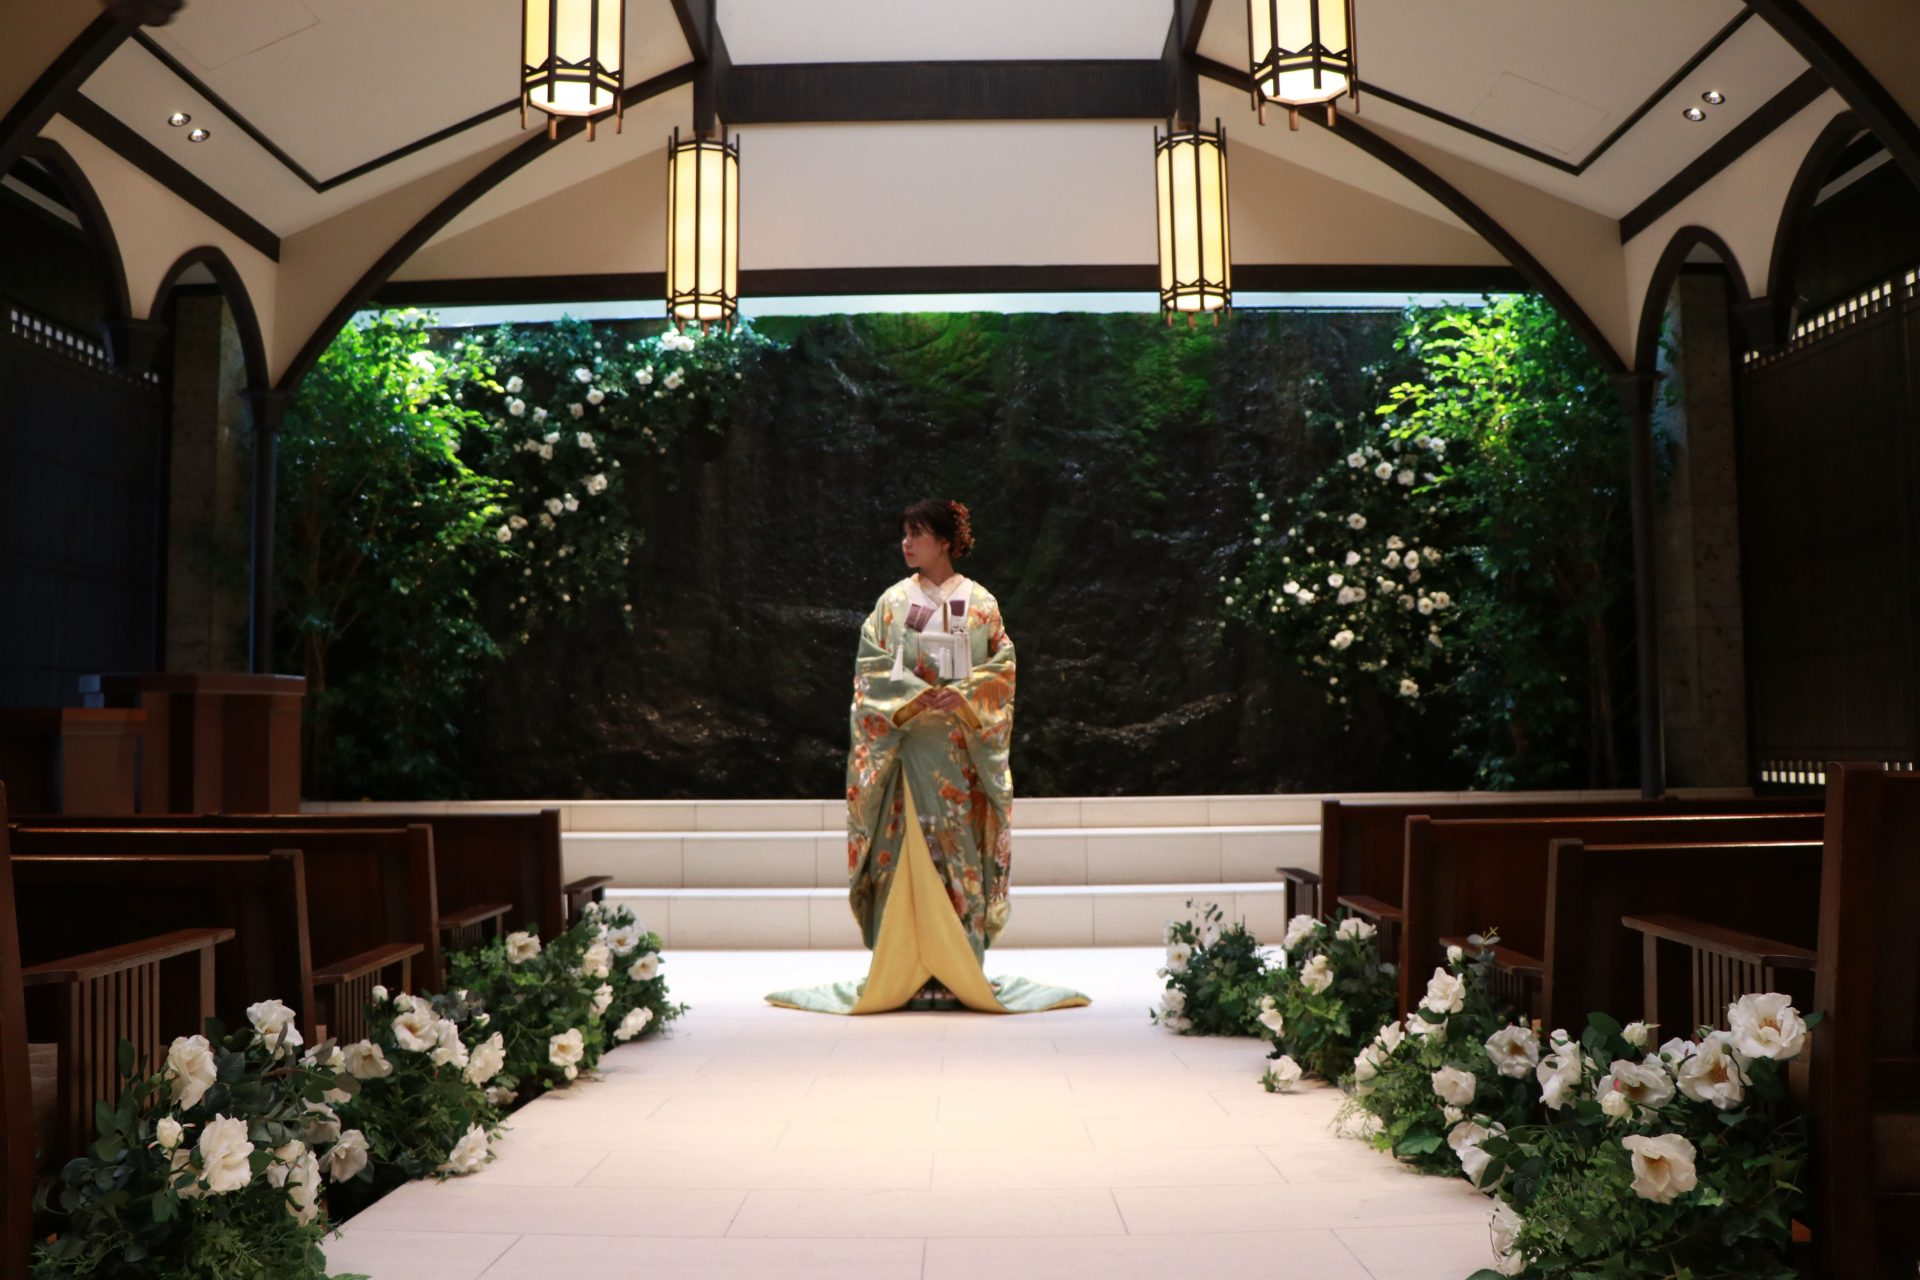 THE TREAT DRESSINGがTHE KAWABUN NAGOYAでお式や前撮りをされる花嫁様におすすめをする色打掛のコーディネート